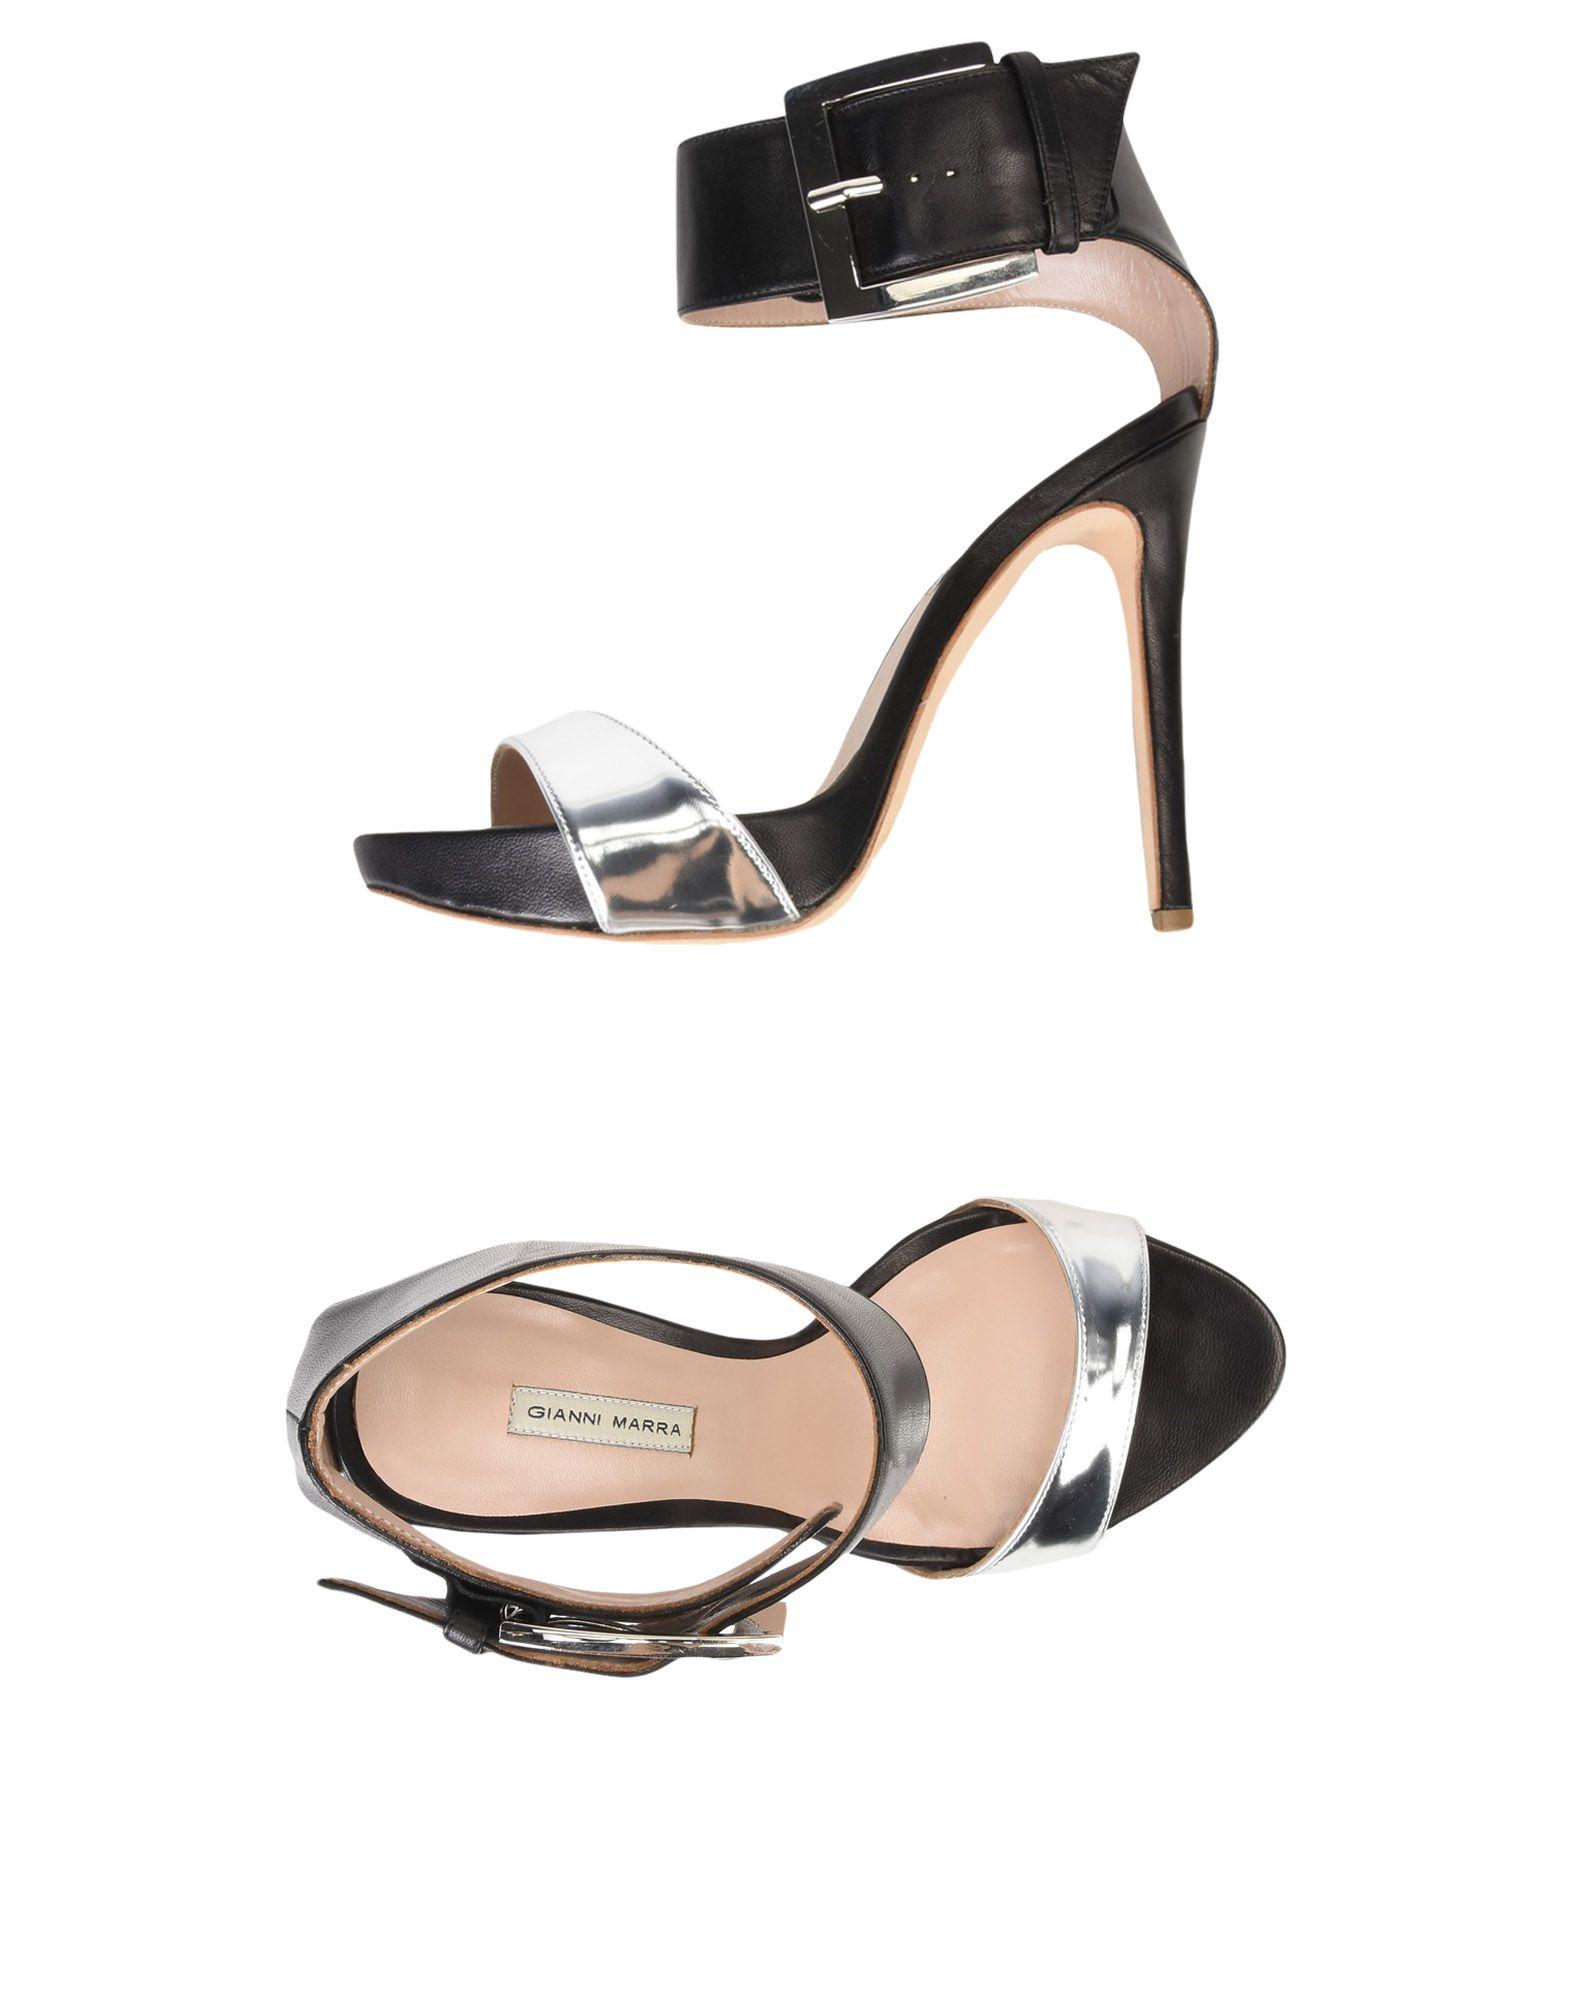 GIANNI MARRA Sandals in Silver